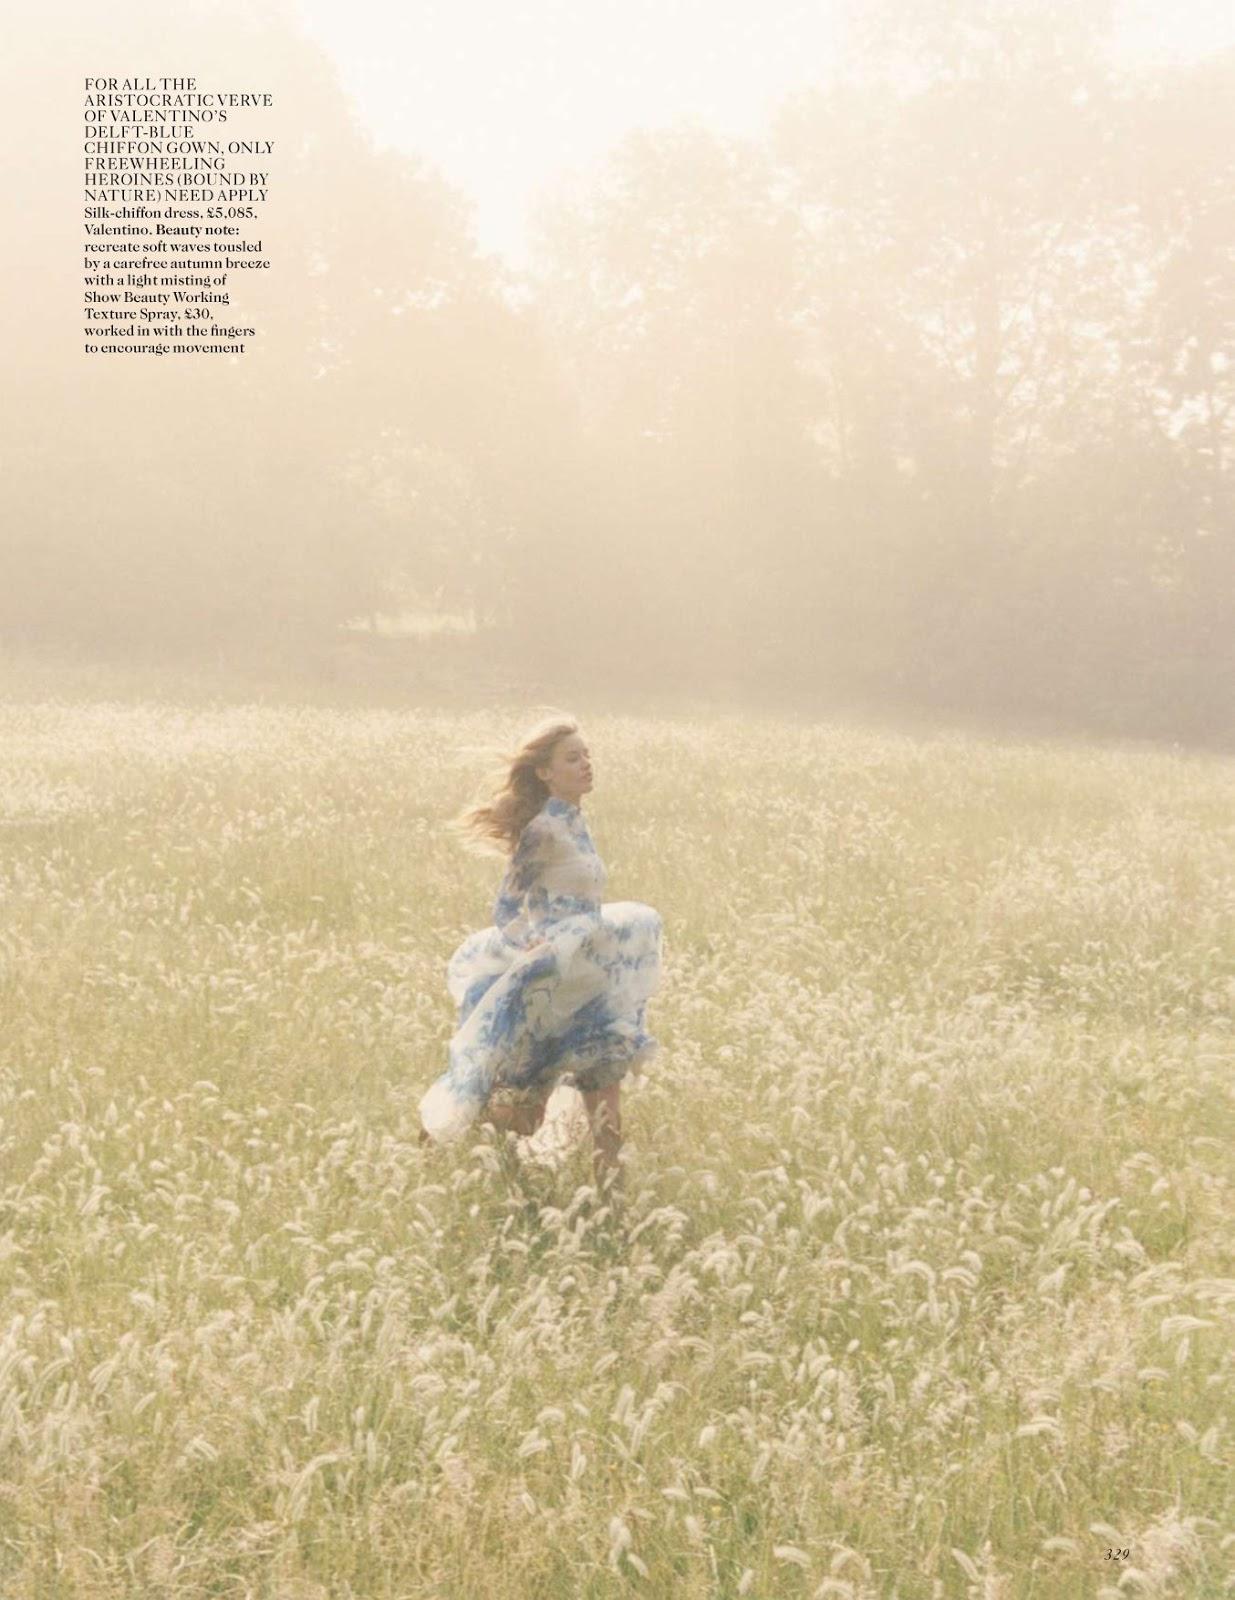 Dream a little dream Georgia May Jagger by Venetia Scott for Vogue UK October 2013 6